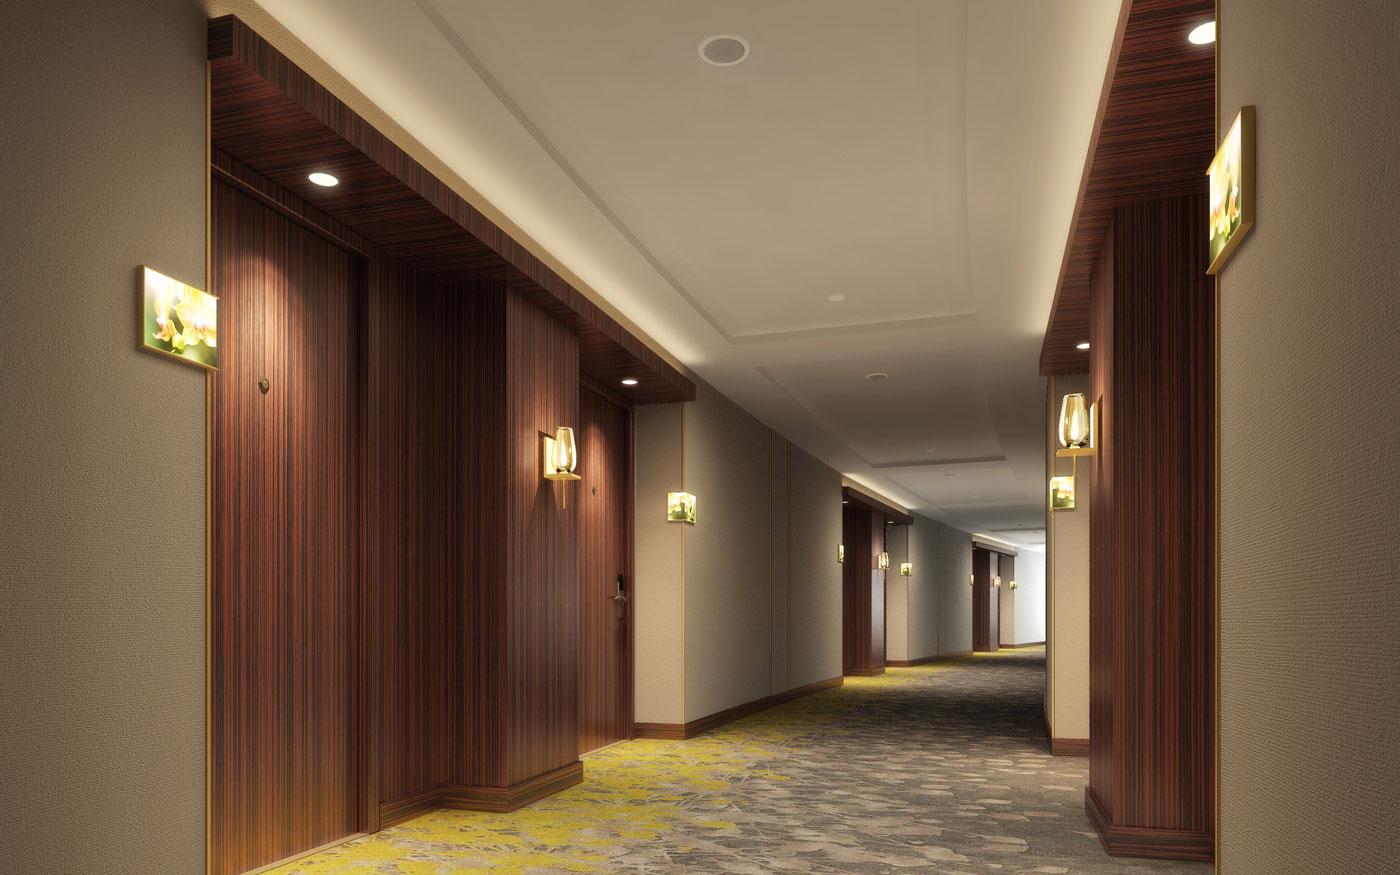 Hilton_garden_inn_3